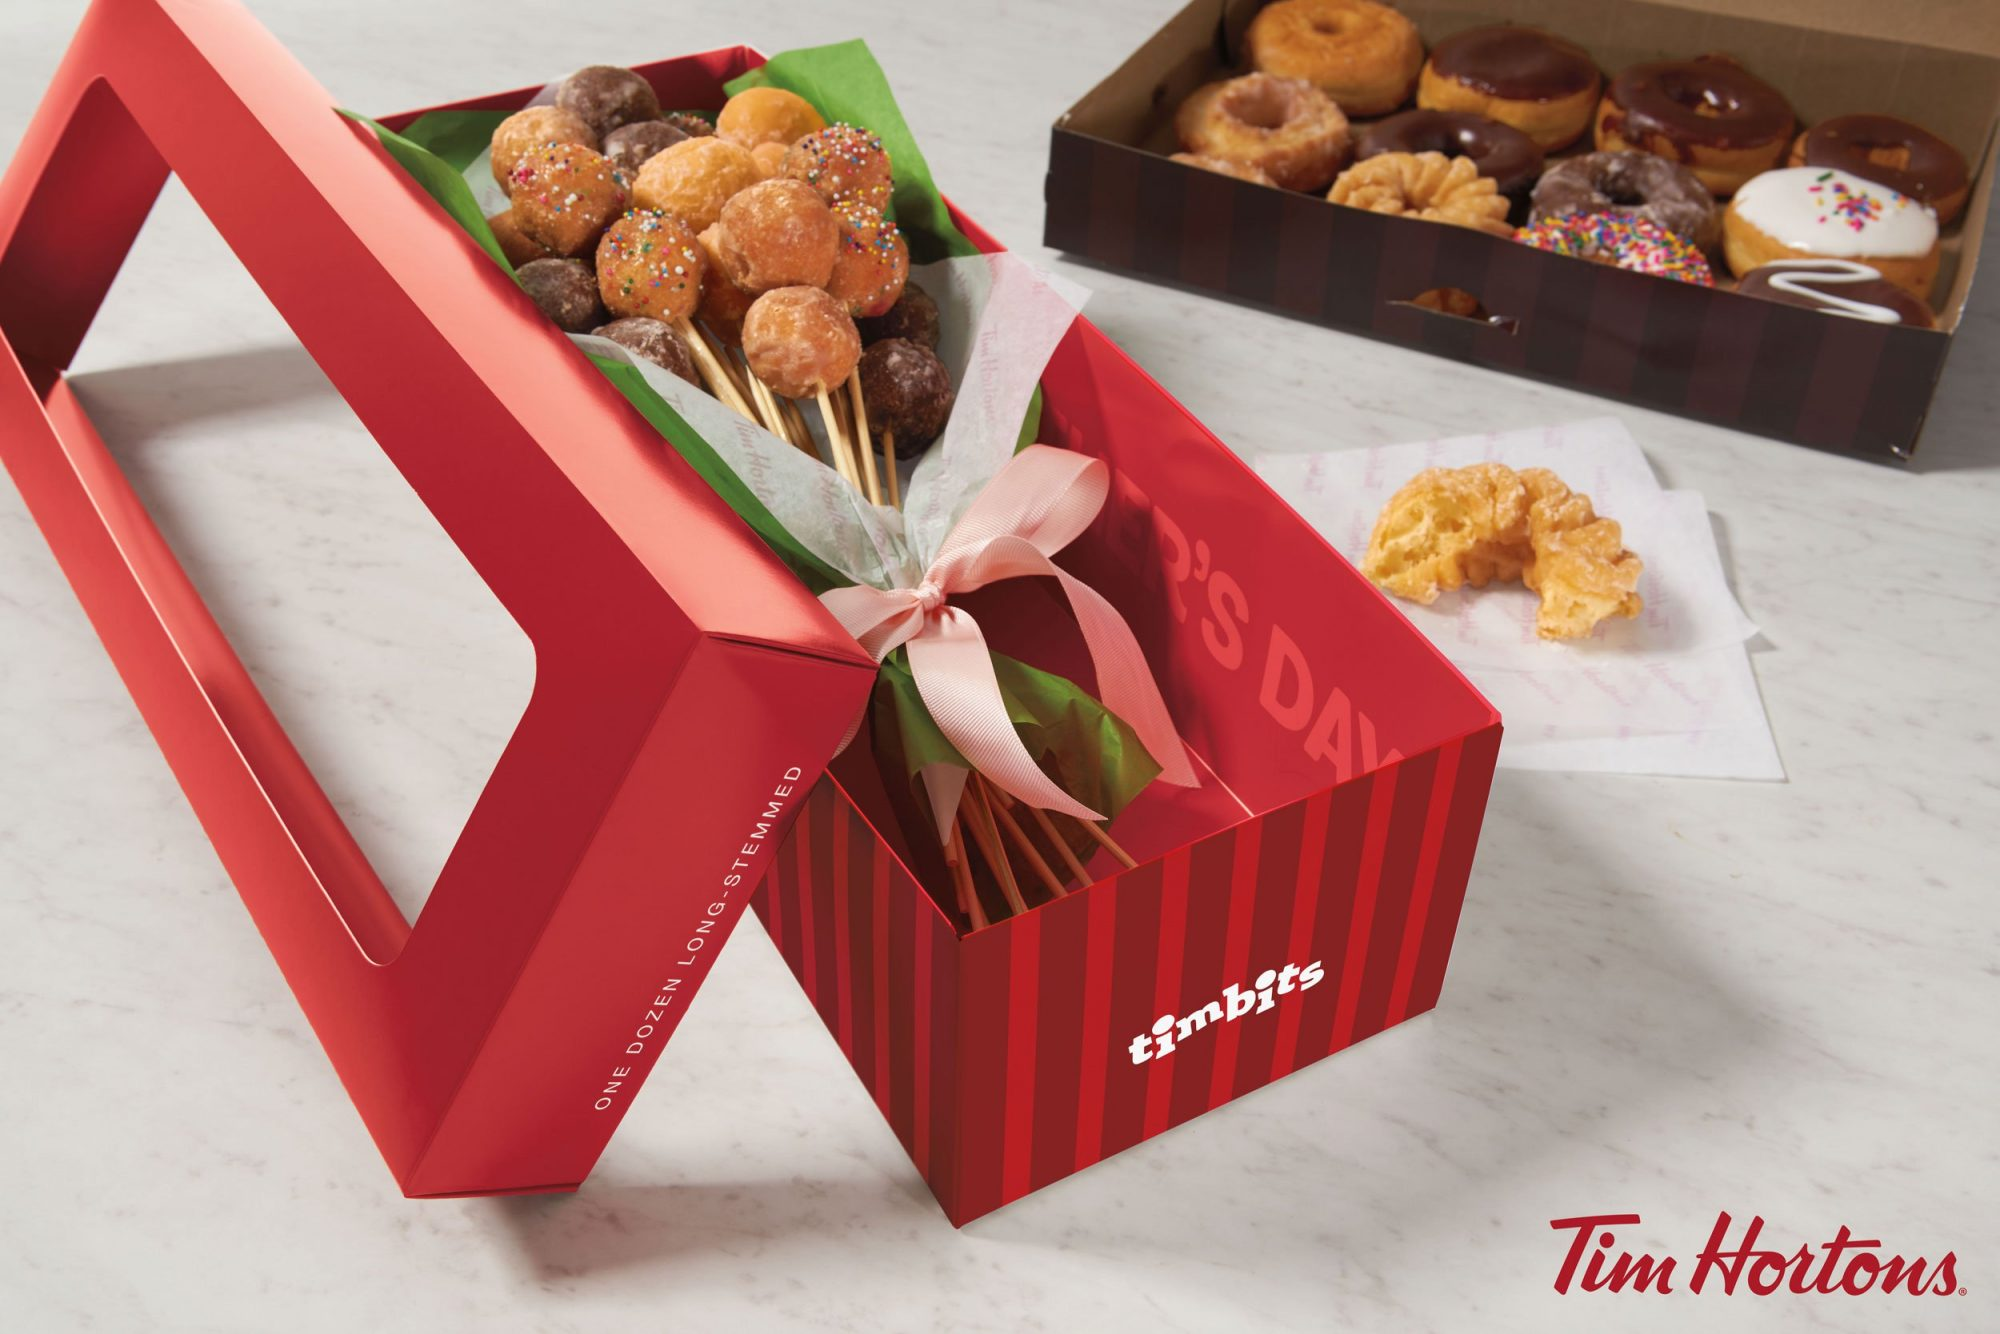 EC: Tim Hortons Has a Doughnut Bouquet for Mother's Day